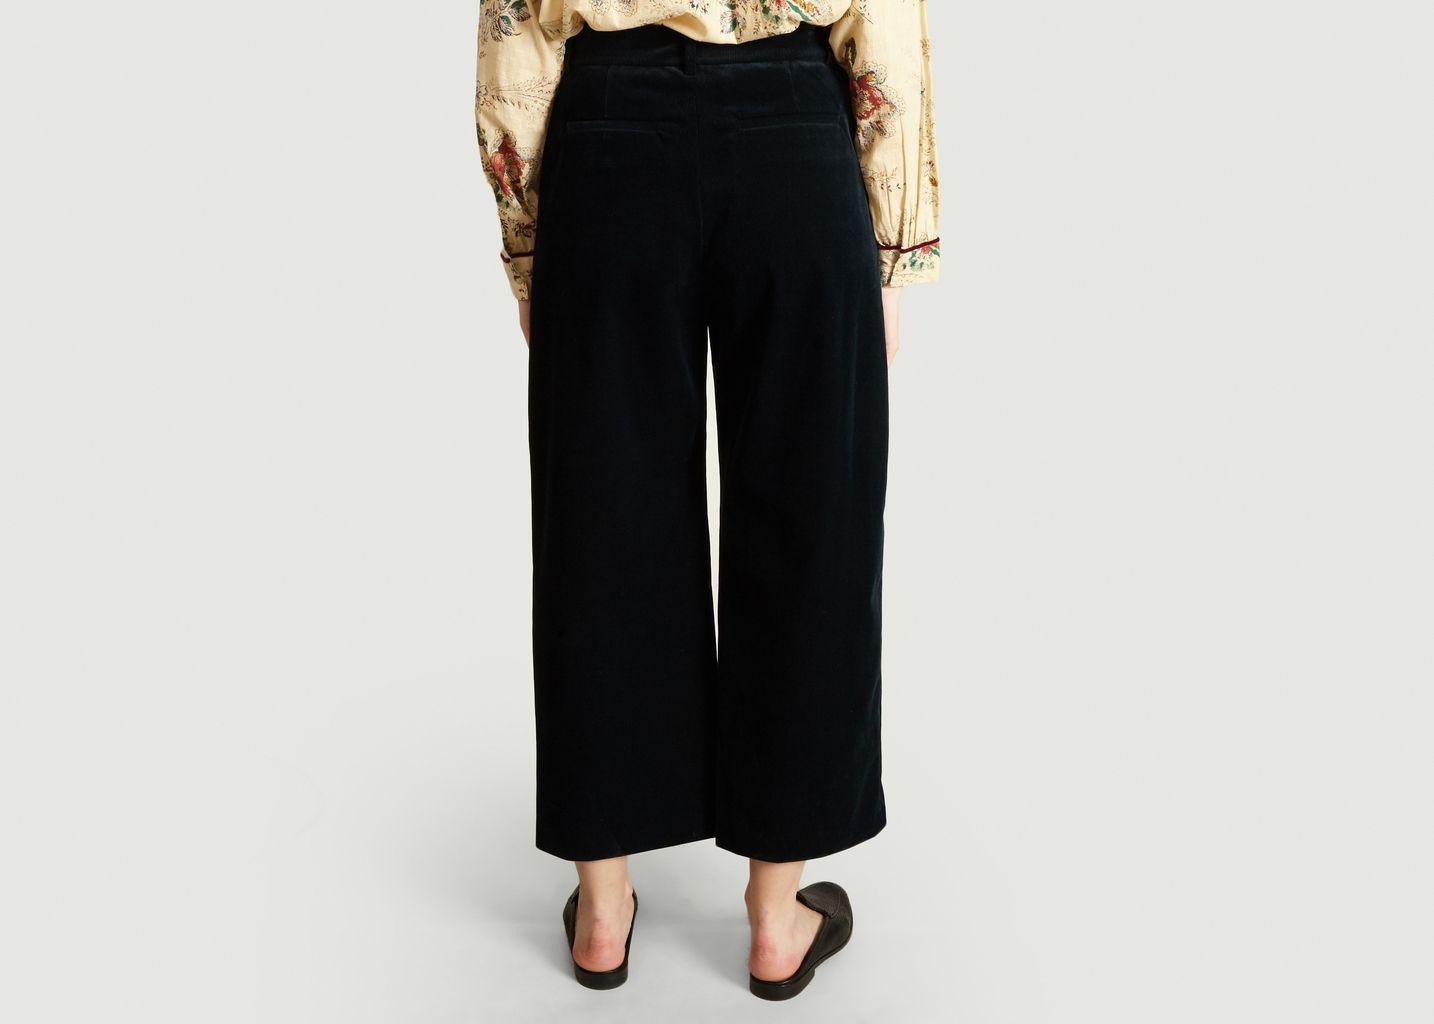 Pantalon Joaquin - Suncoo